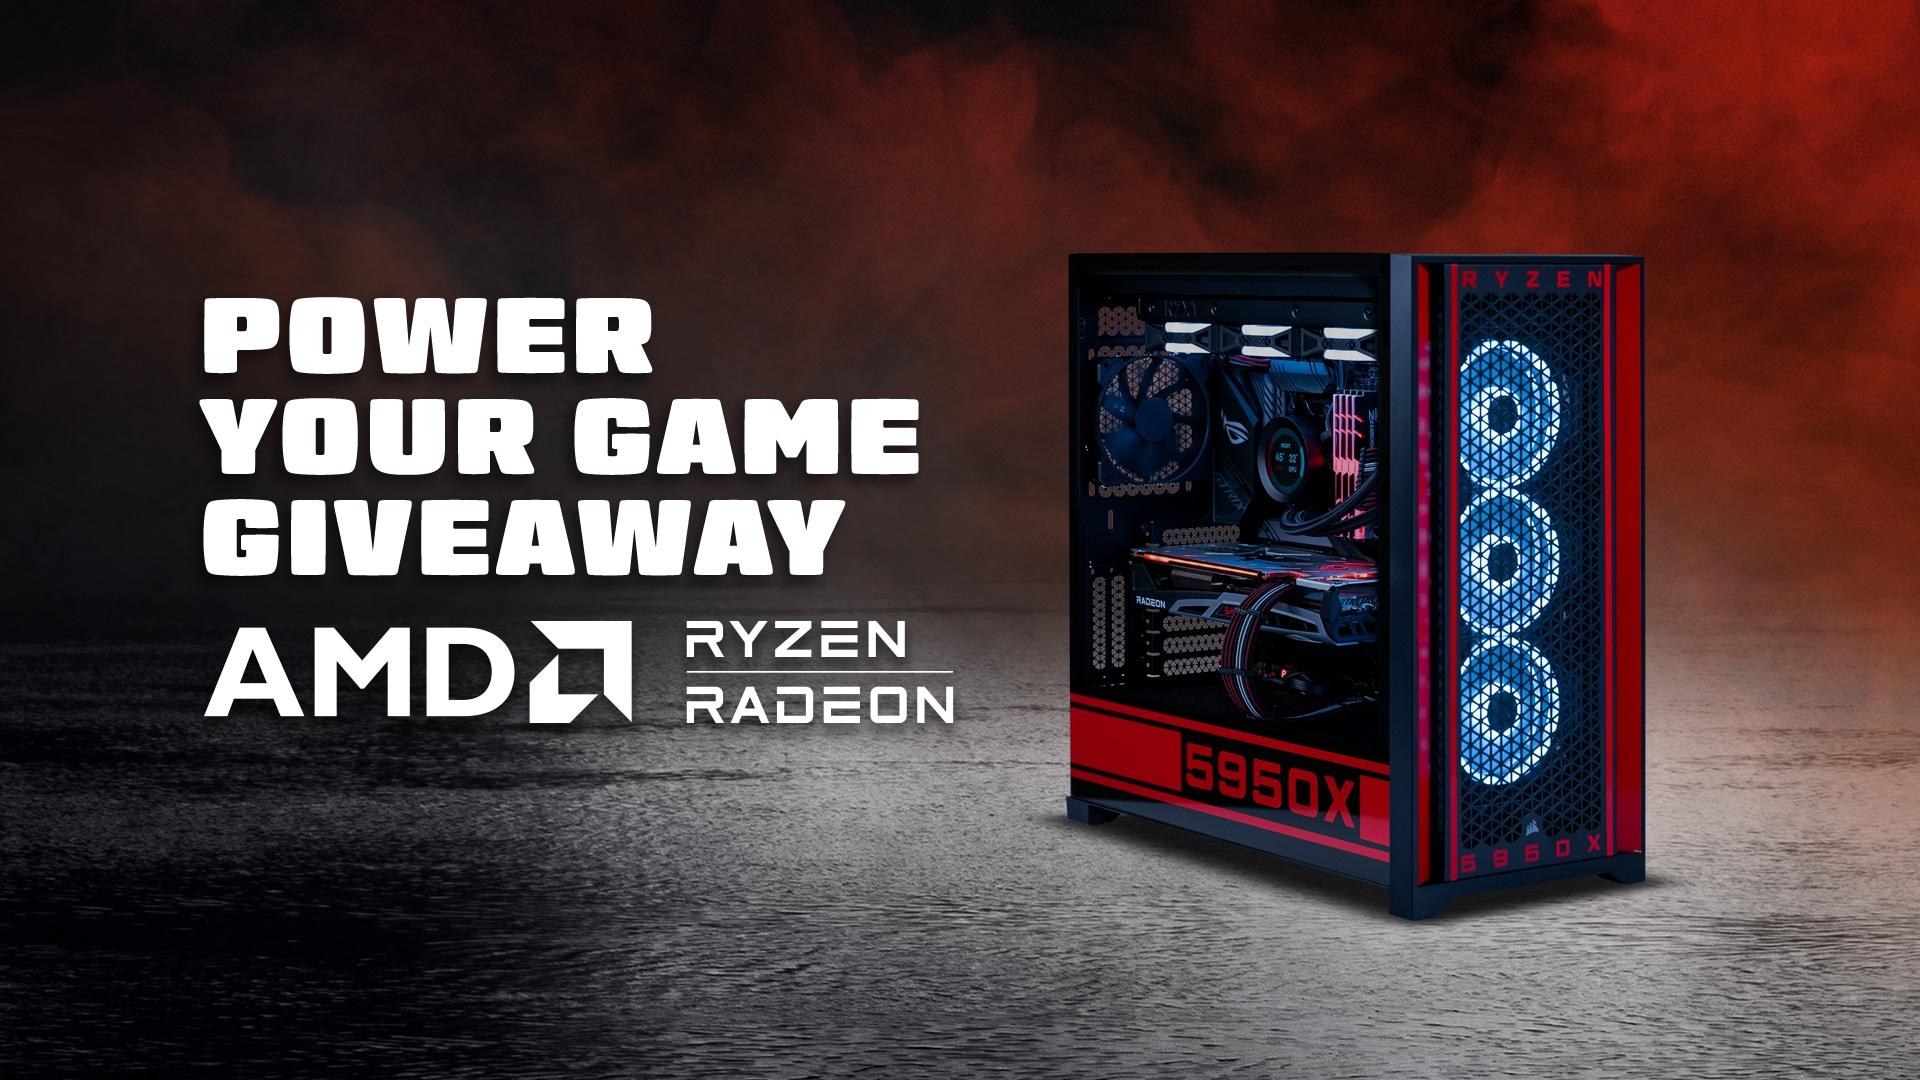 AMD Ryzen 9 5950X Custom PC Build Giveaway Image